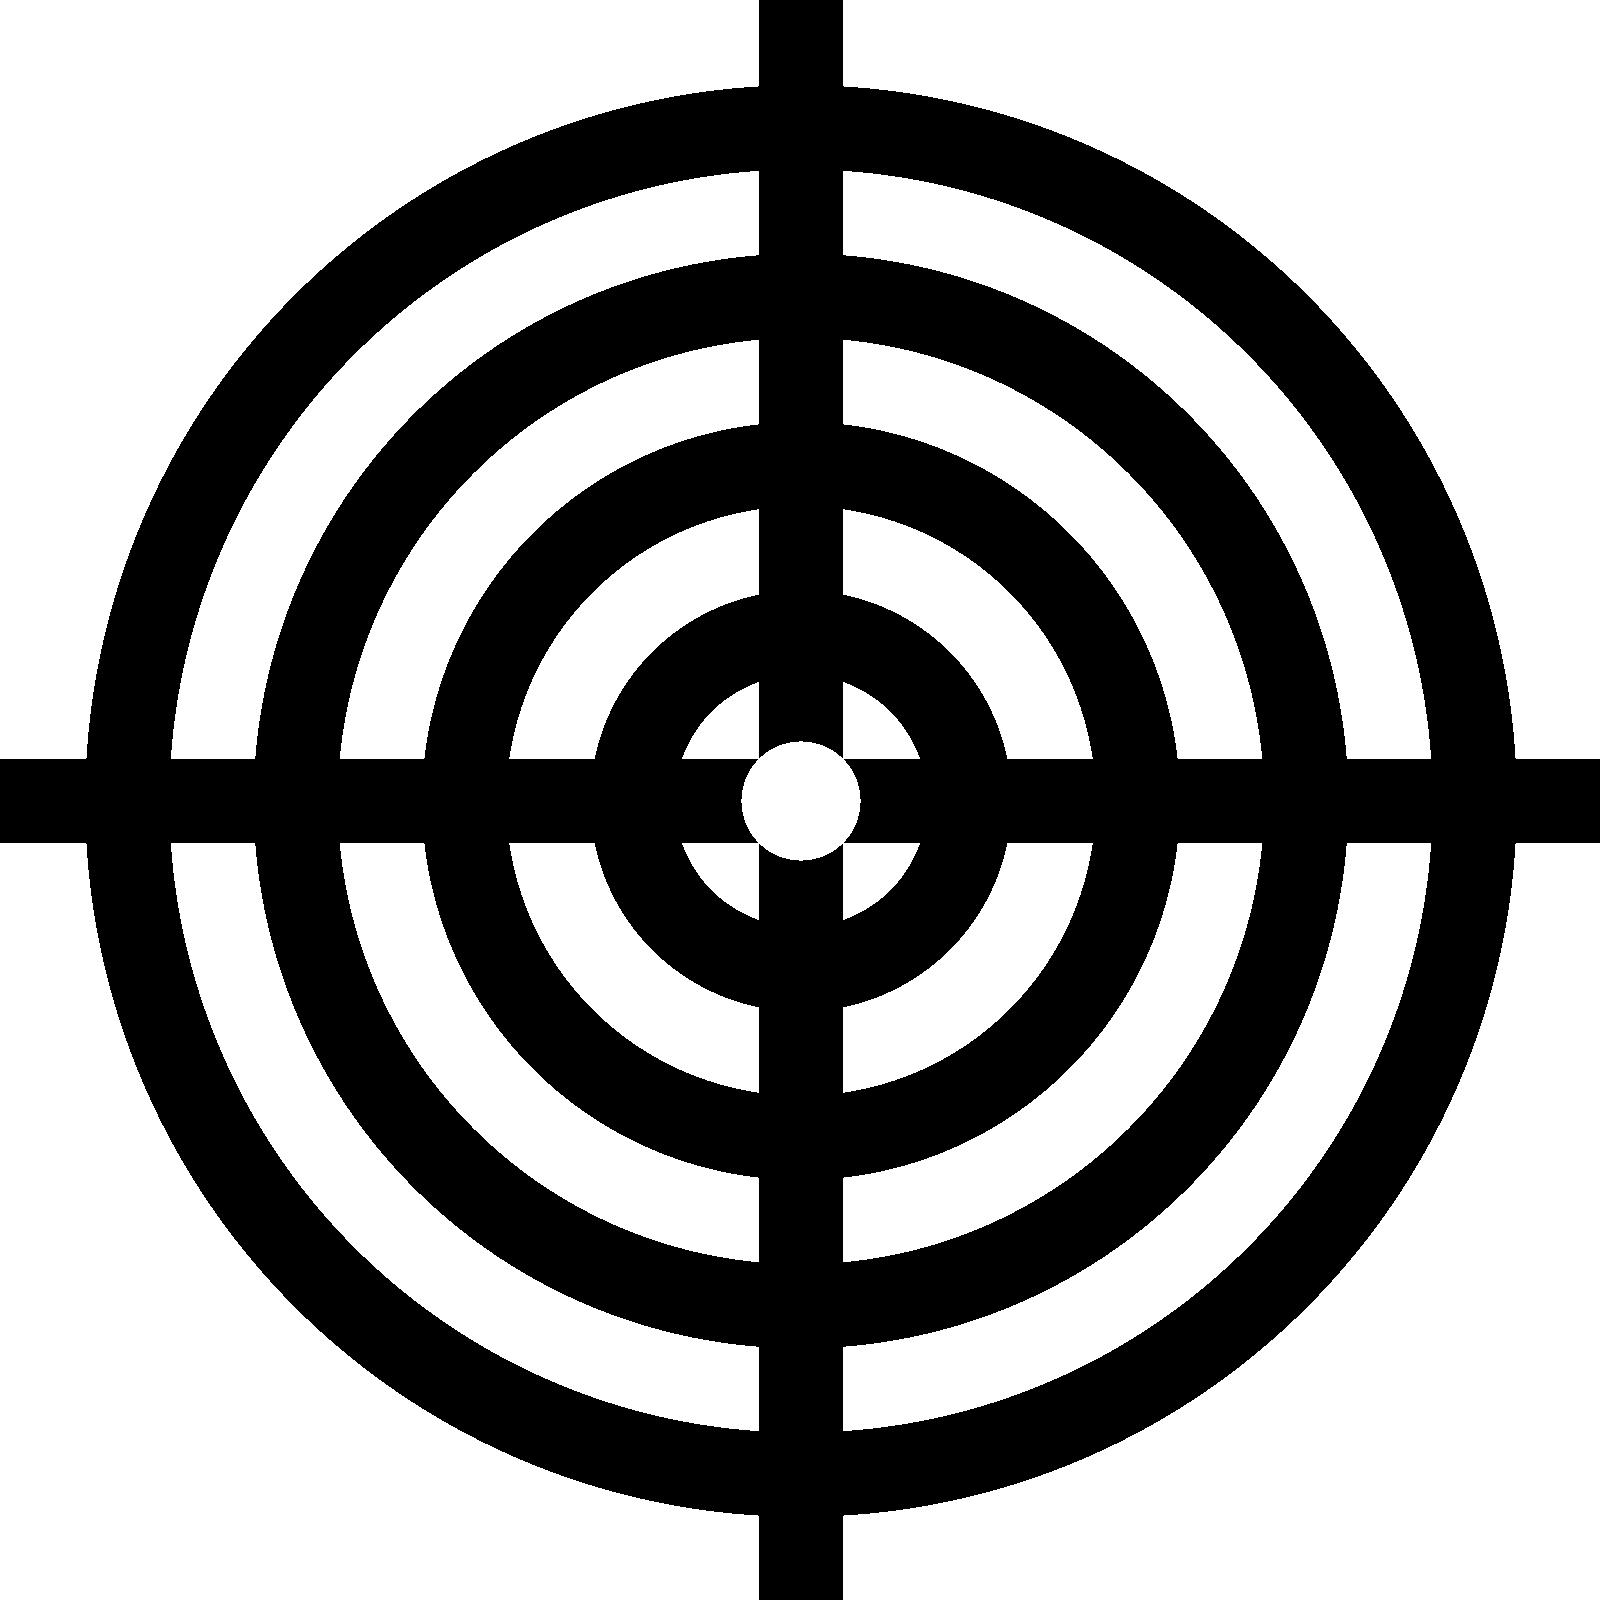 index of kenta www three target brzolmsf